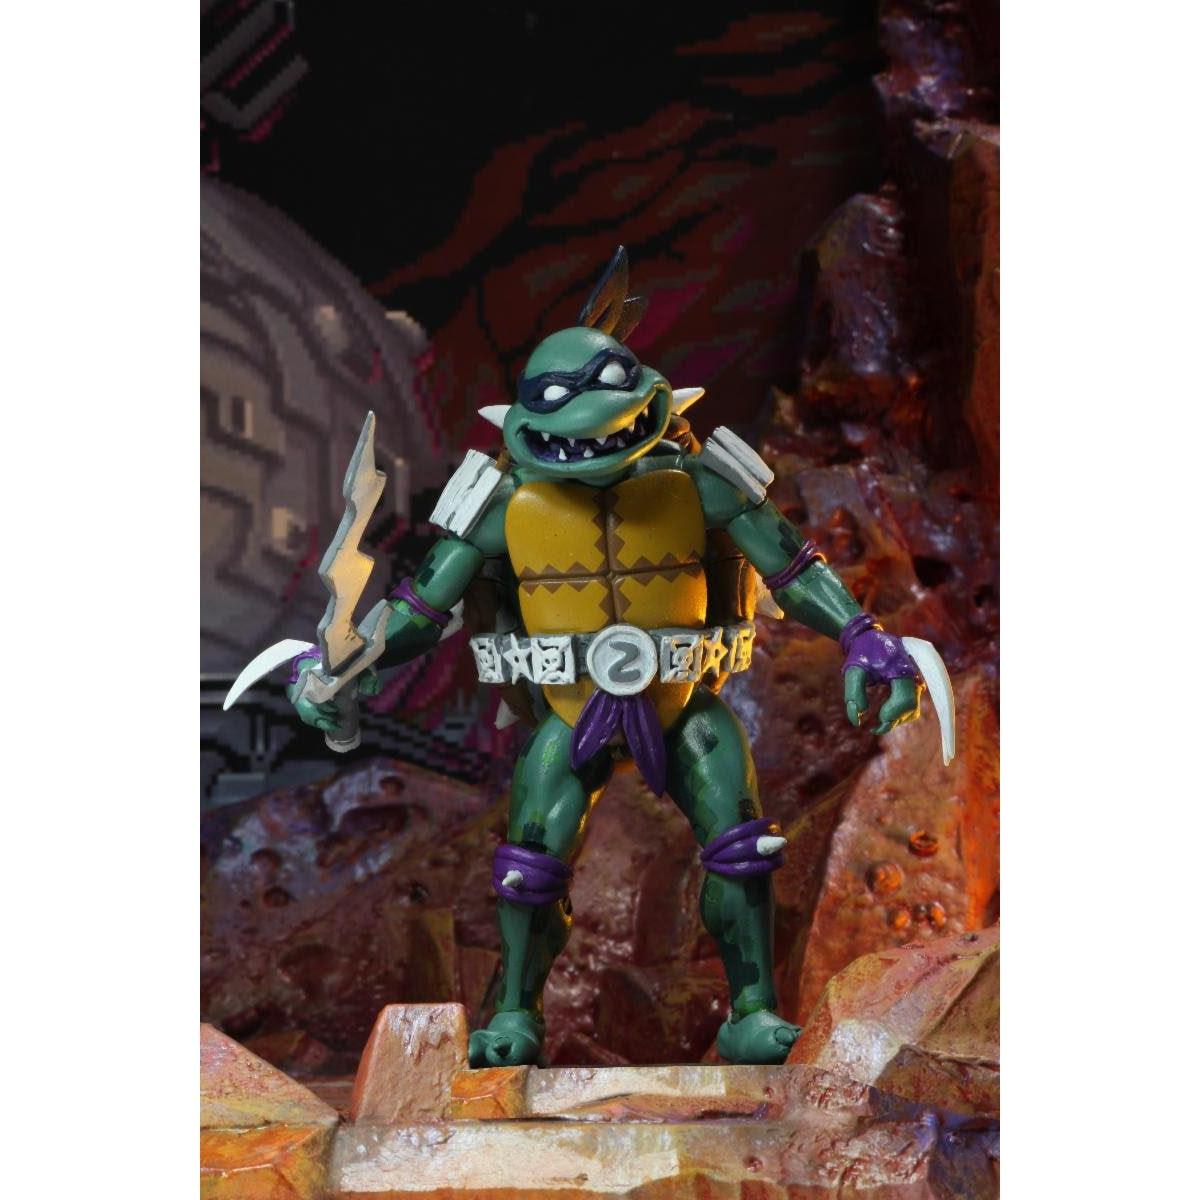 "Image of TMNT: Turtles in Time - 7"" Scale Action Figures - Slash - NOVEMBER 2019"